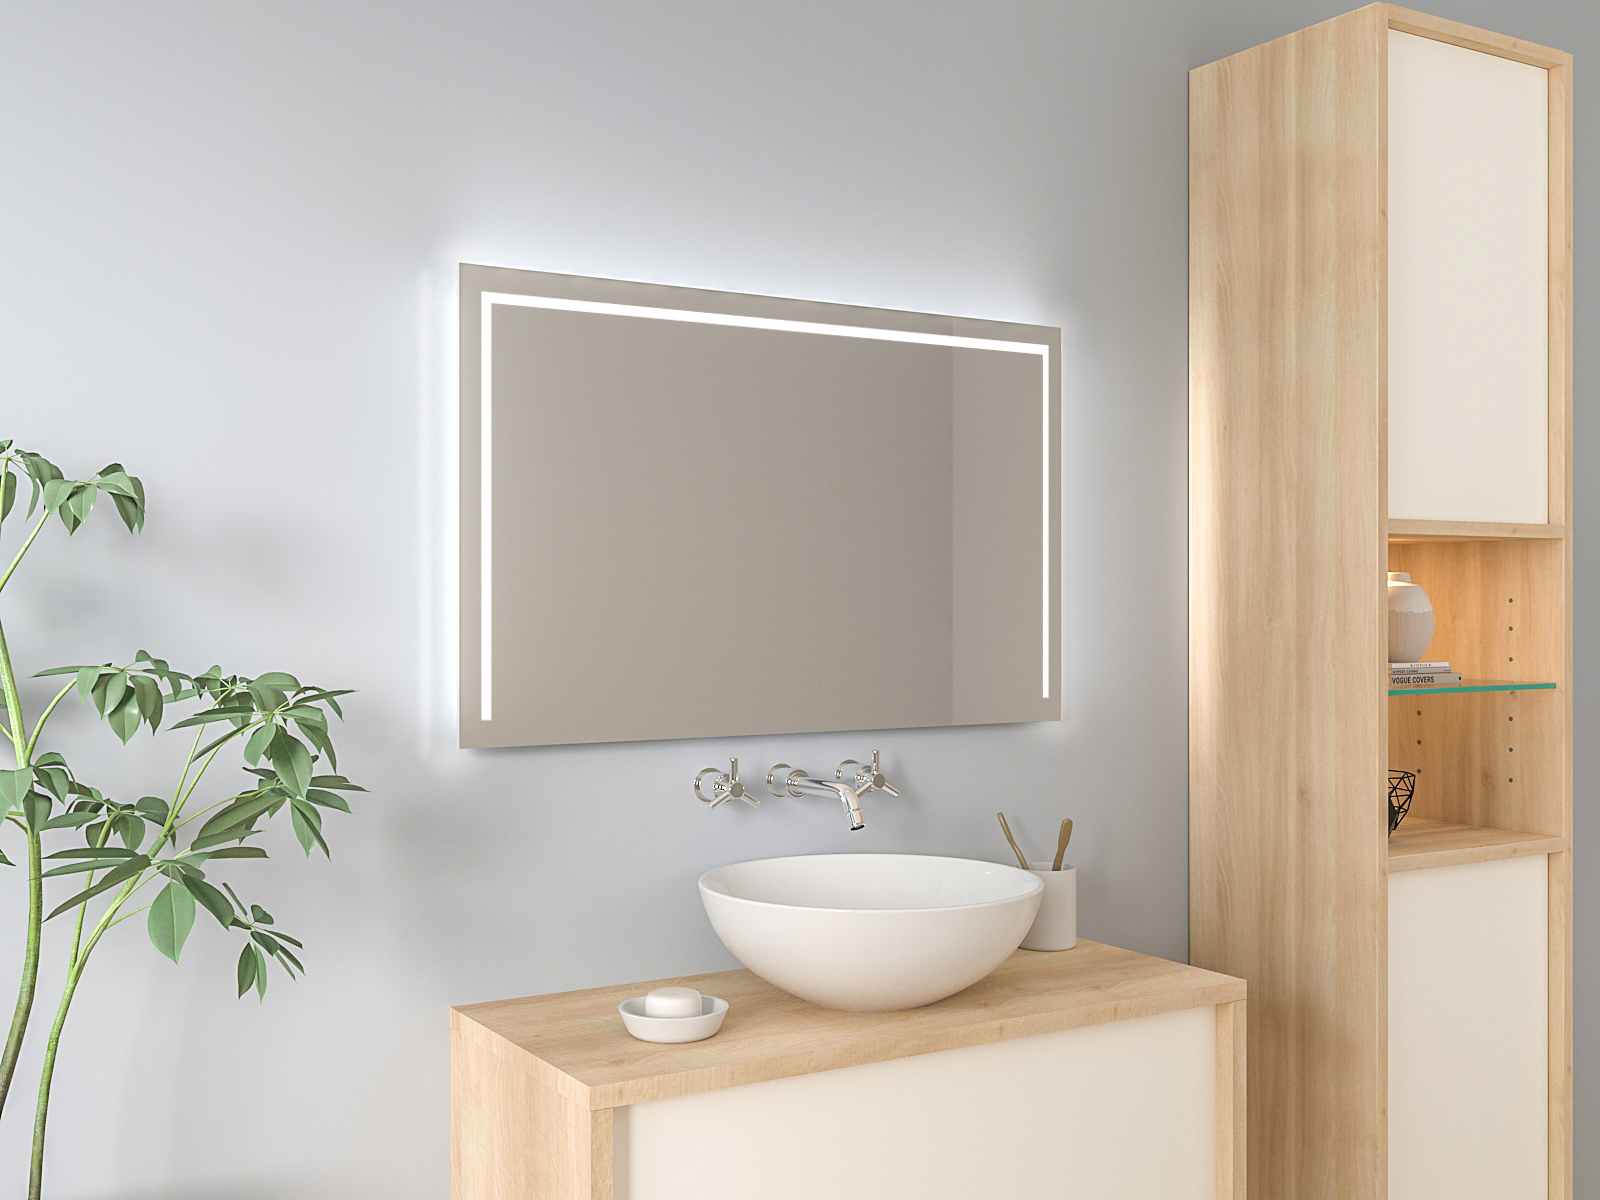 Badspiegel mit LED Beleuchtung - Atle